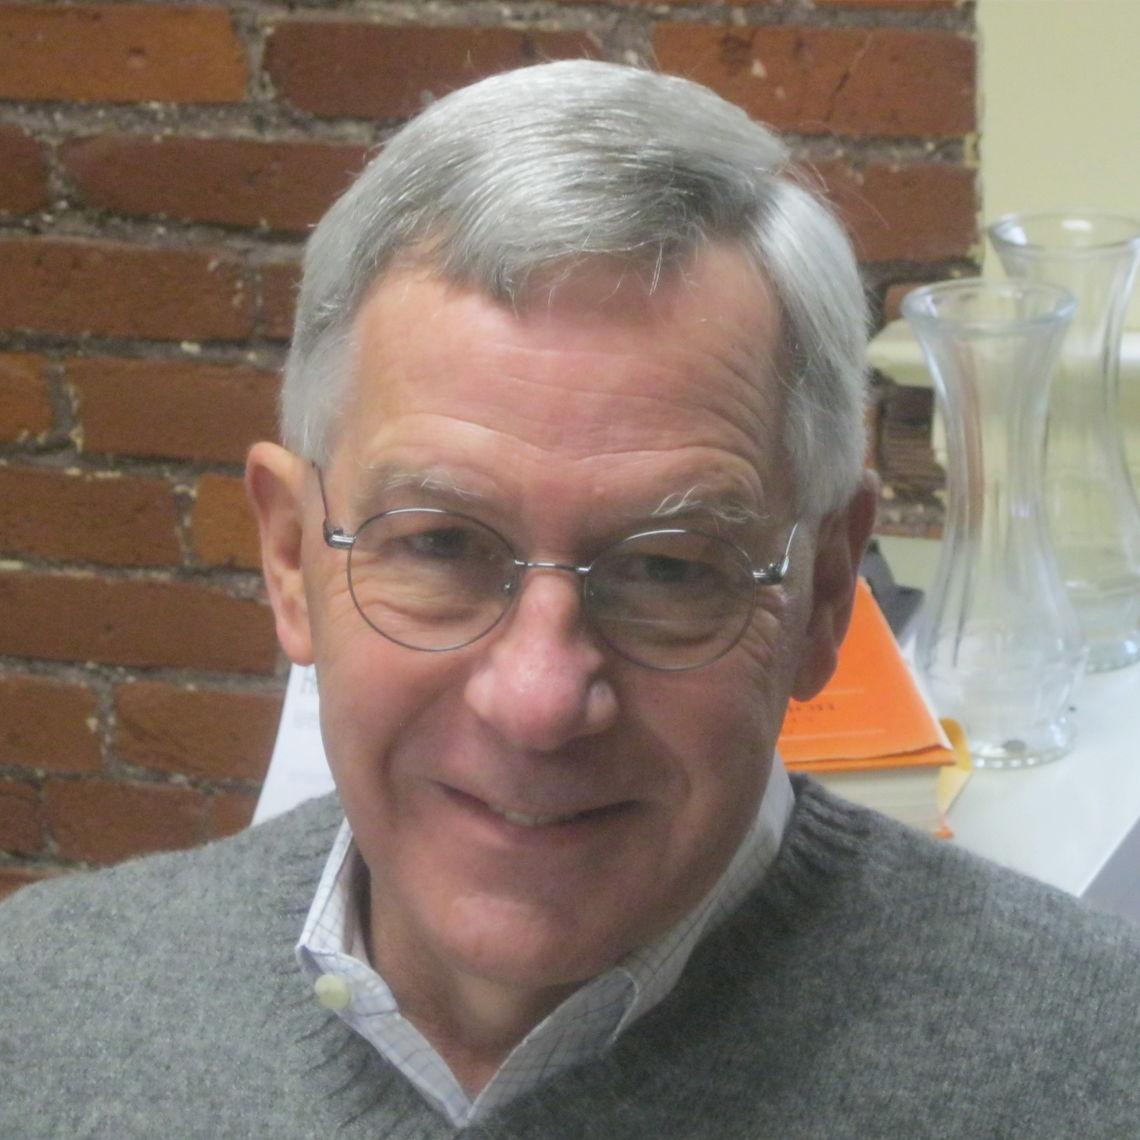 david schuyler 2014